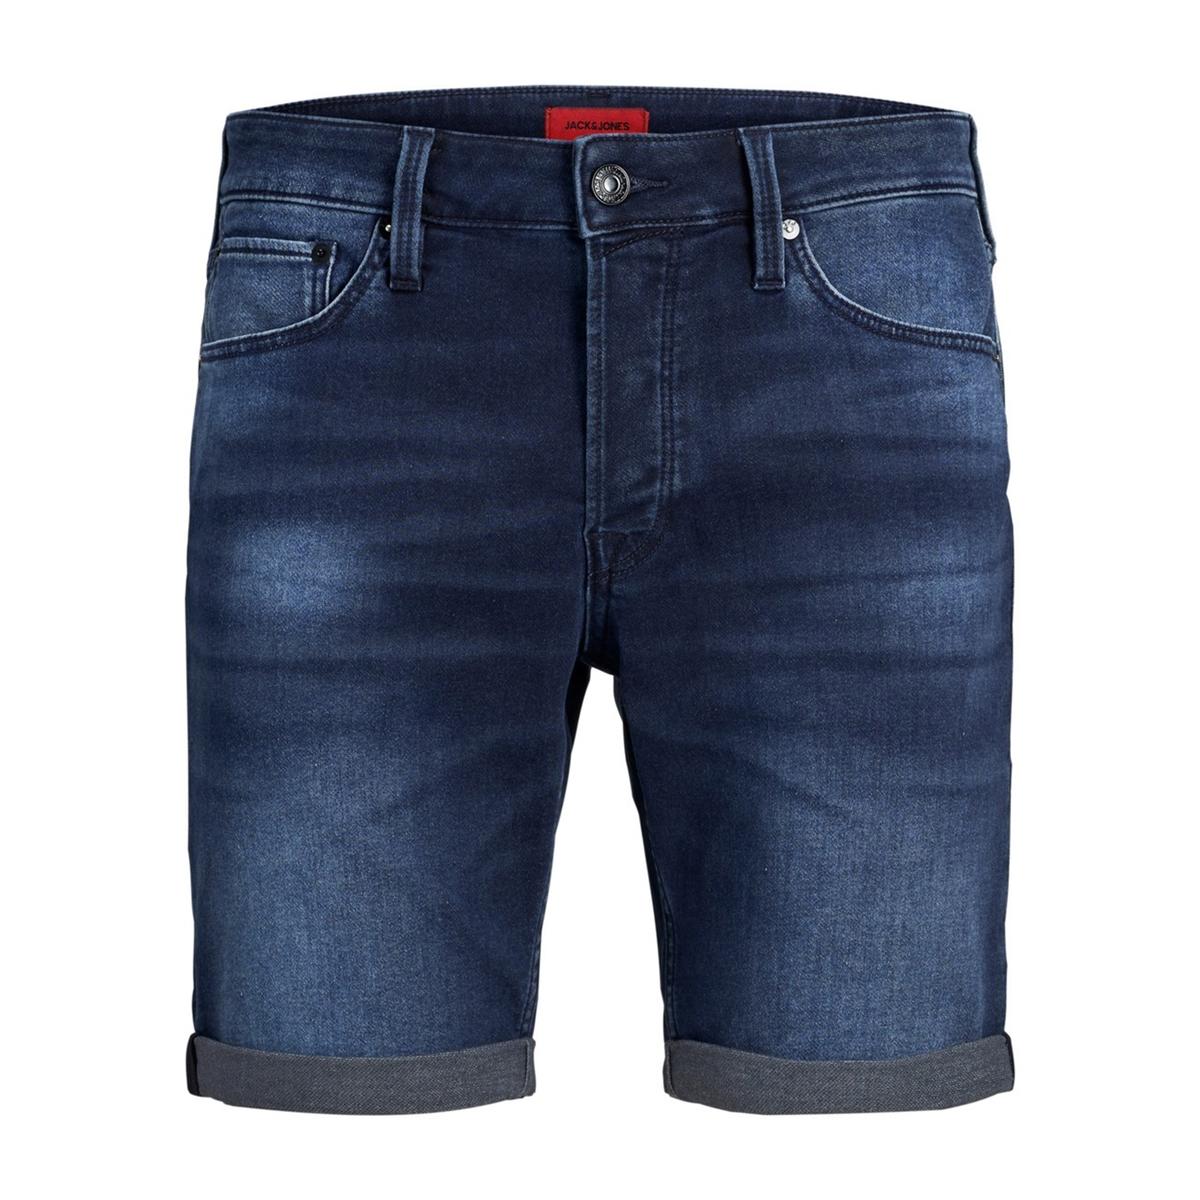 Бермуды La Redoute Из джинсовой ткани супер стрейч Rick XXL синий